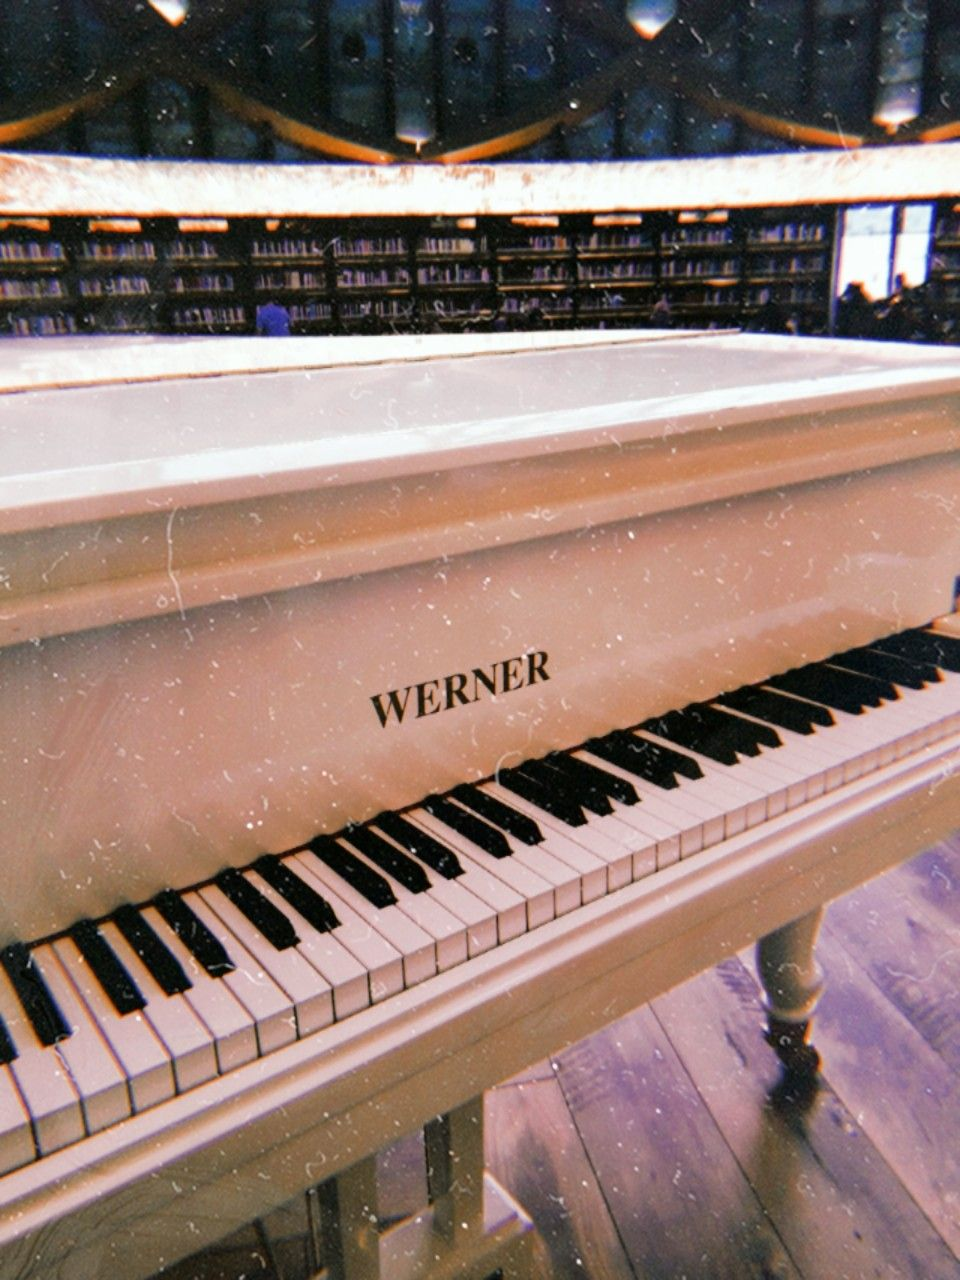 Pin By Meribumia On Aesthetic Piano Music Piano Music Aesthetic